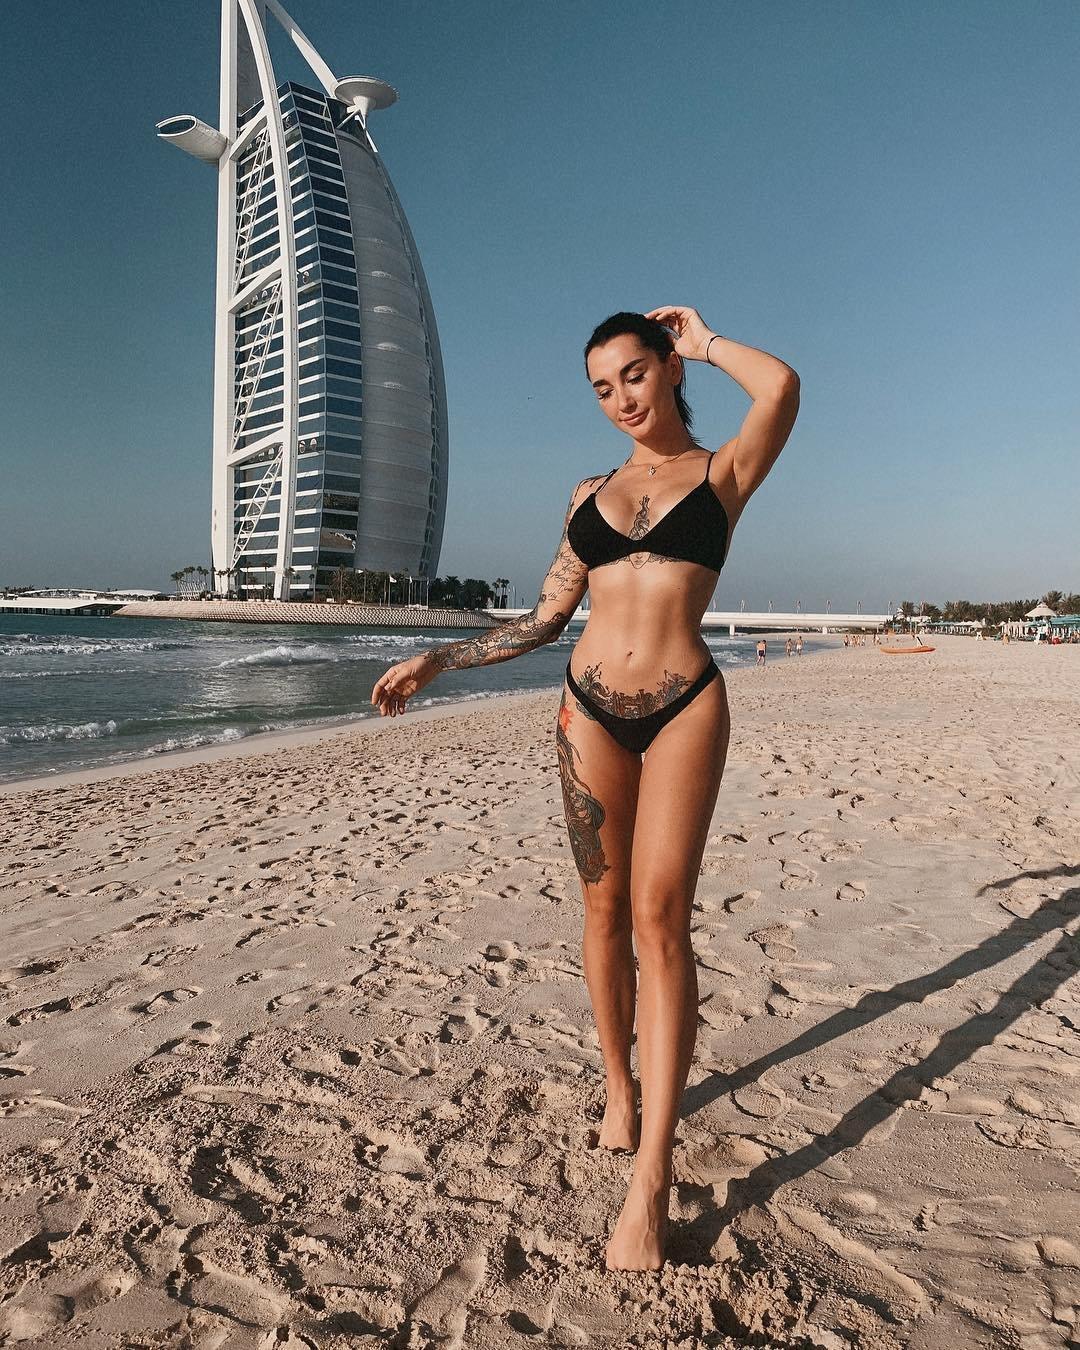 Анжелика Андерсон в ОАЭ